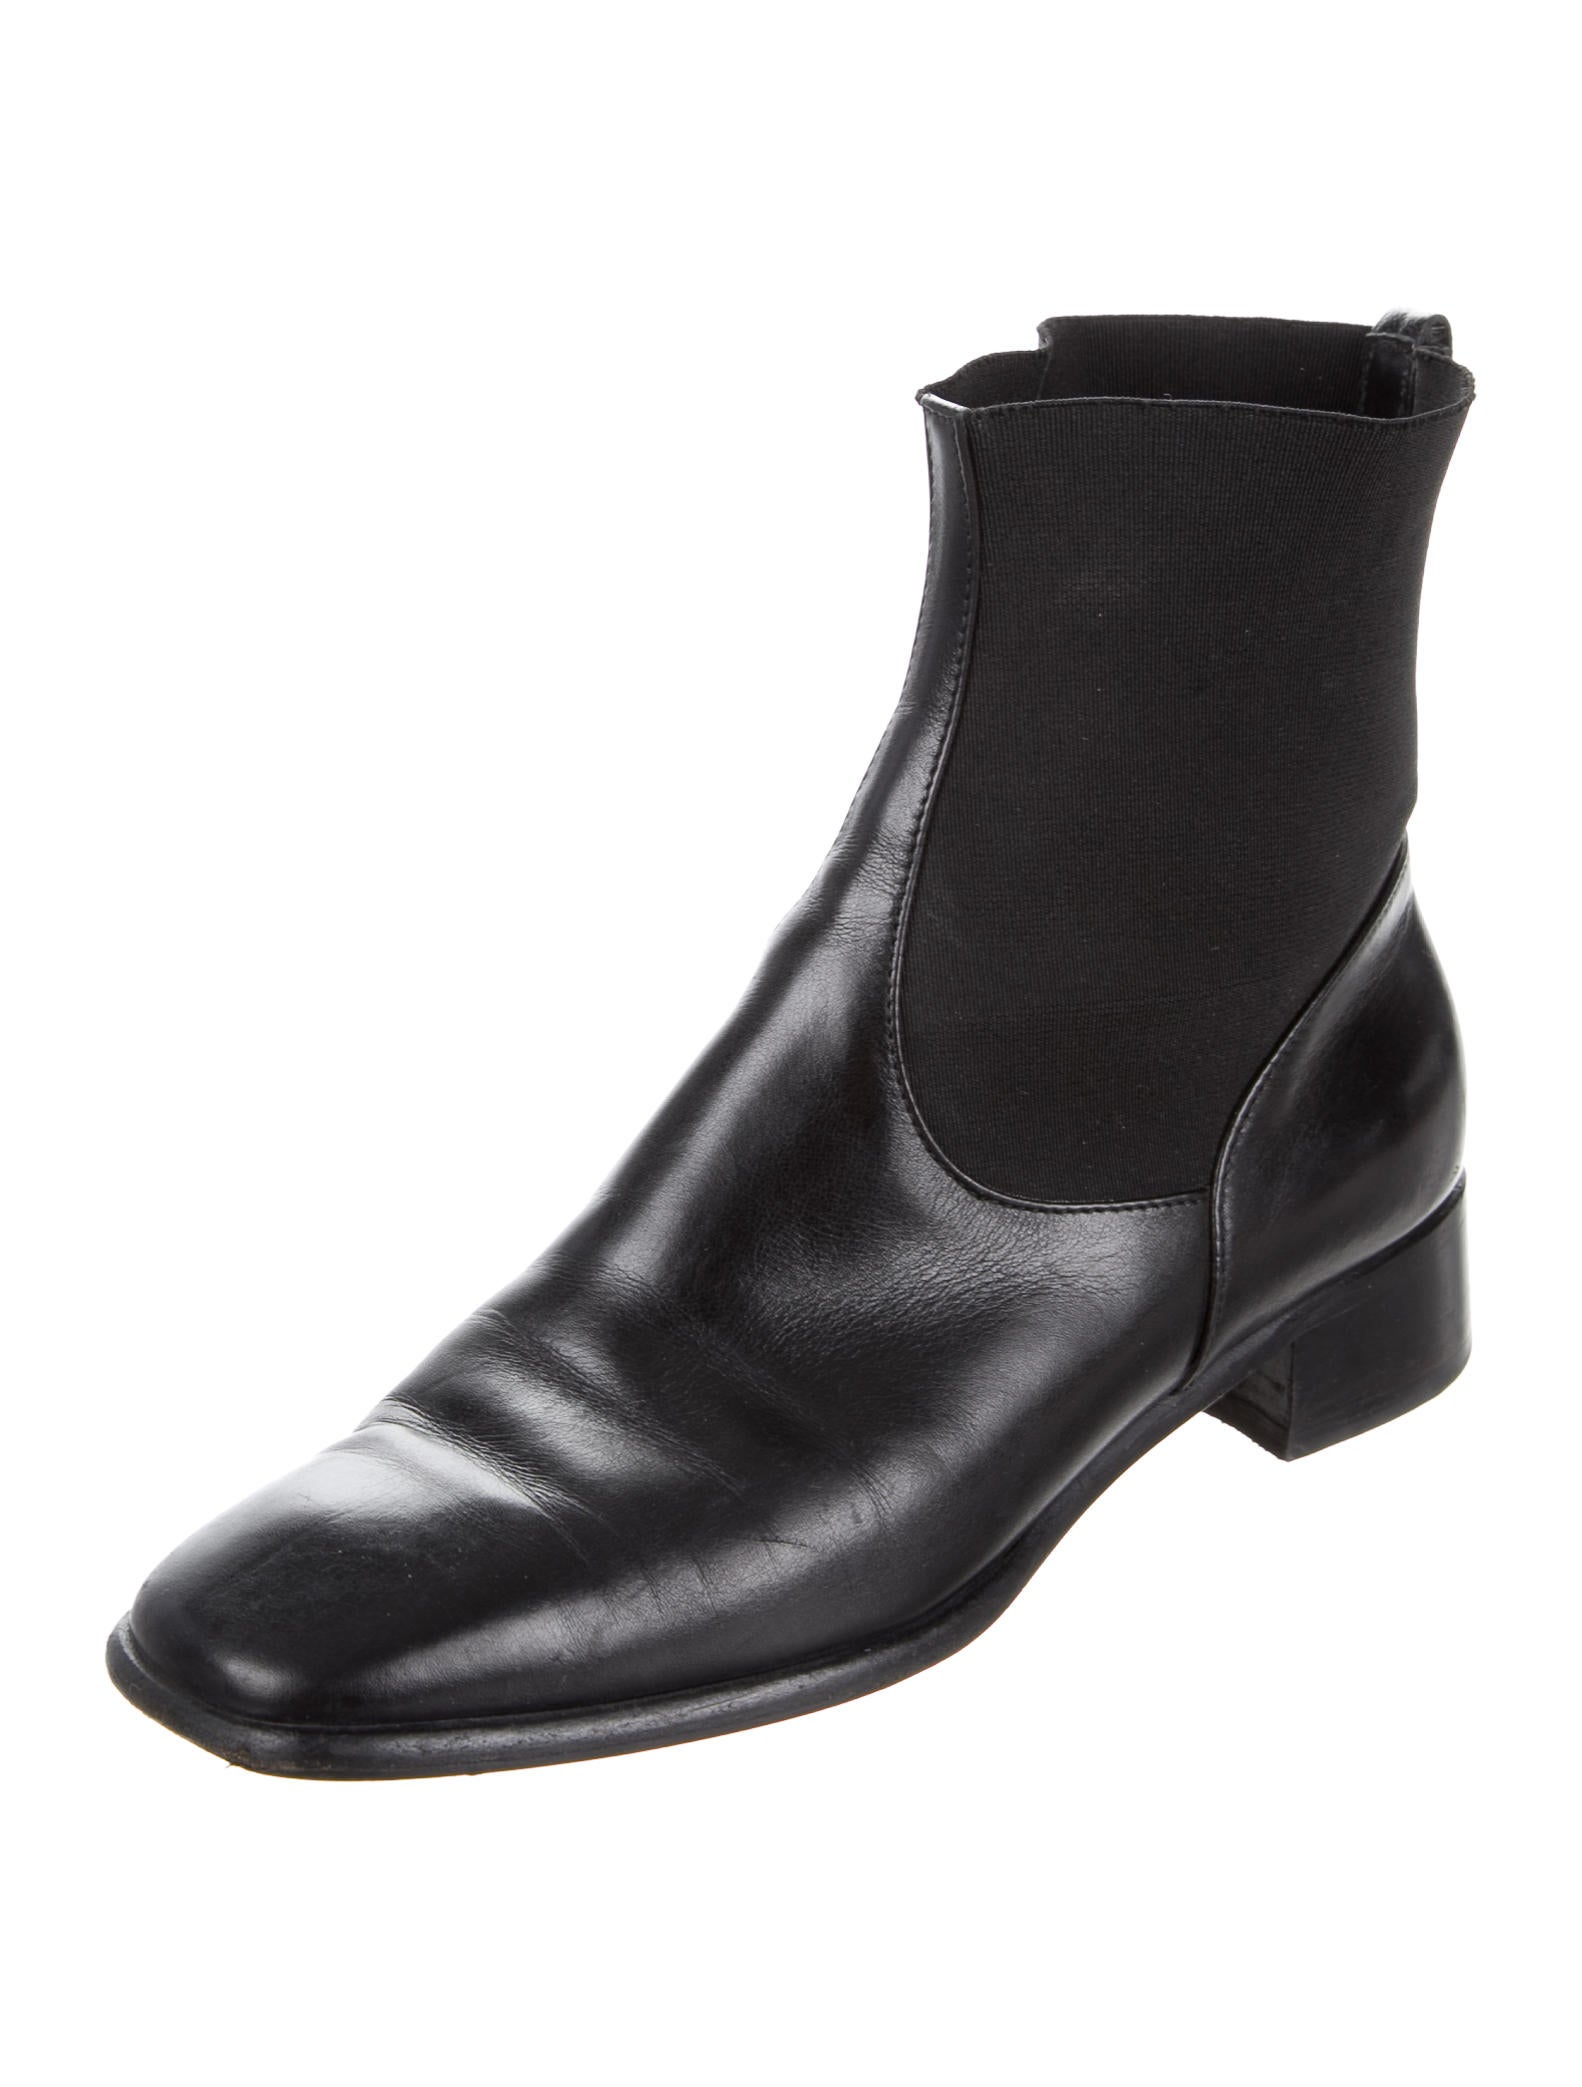 salvatore ferragamo leather square toe ankle boots shoes